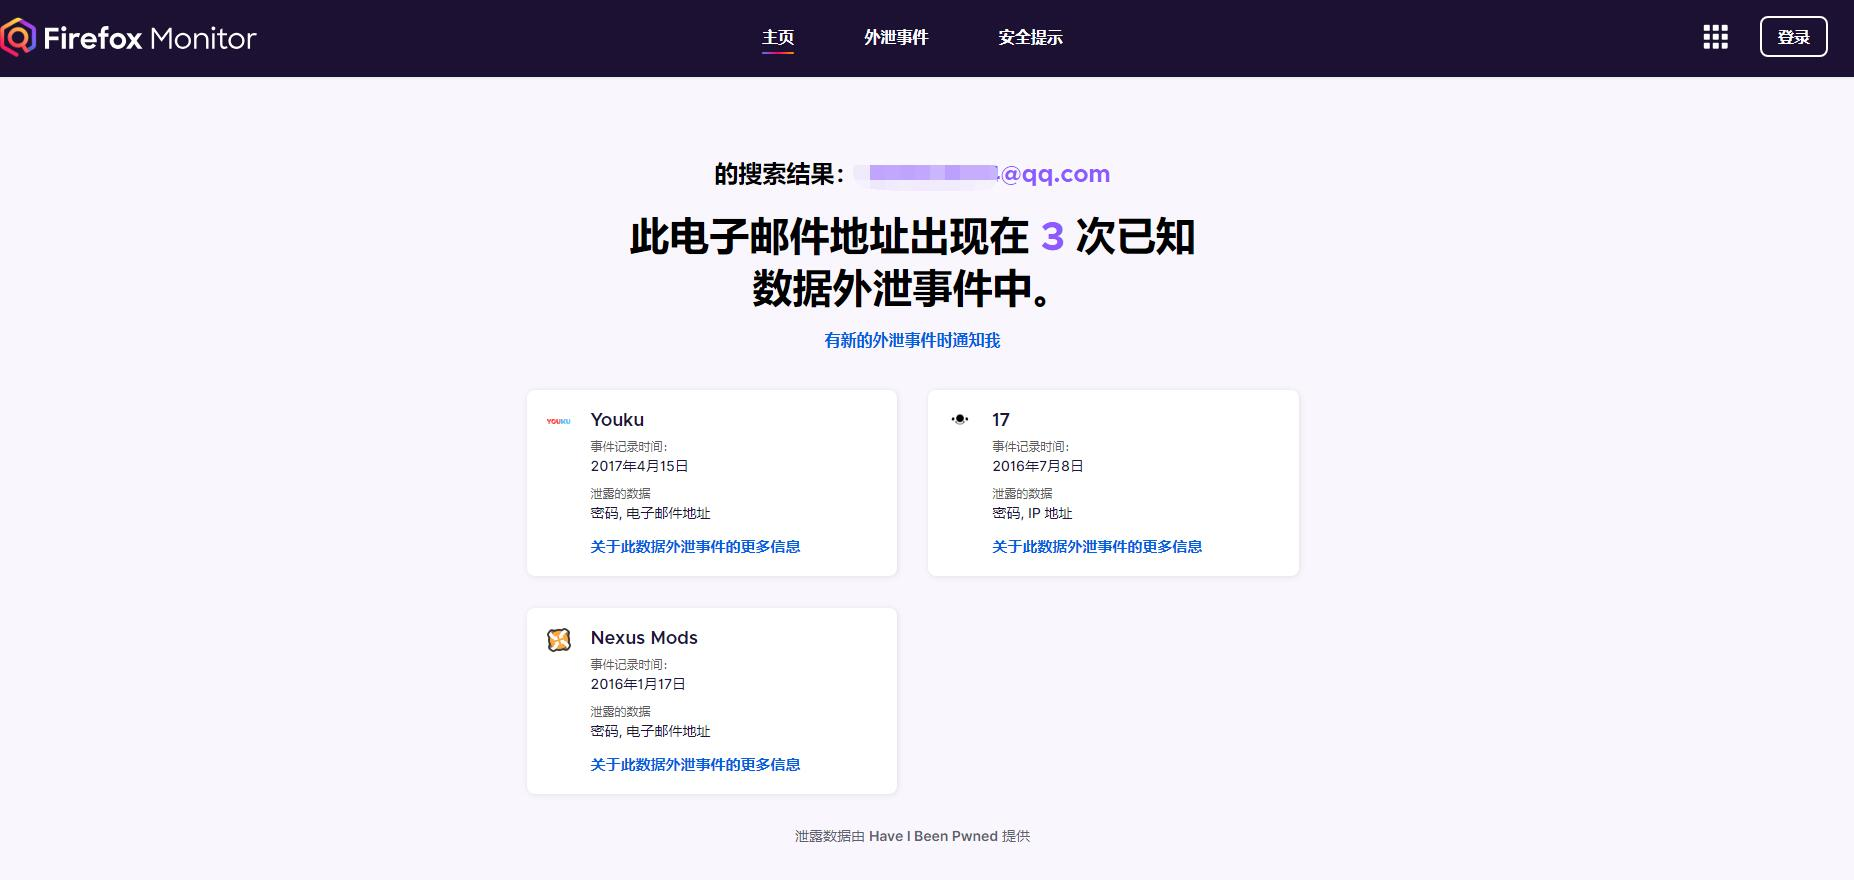 Firefox monitor – 在线查账号数据是否有外泄